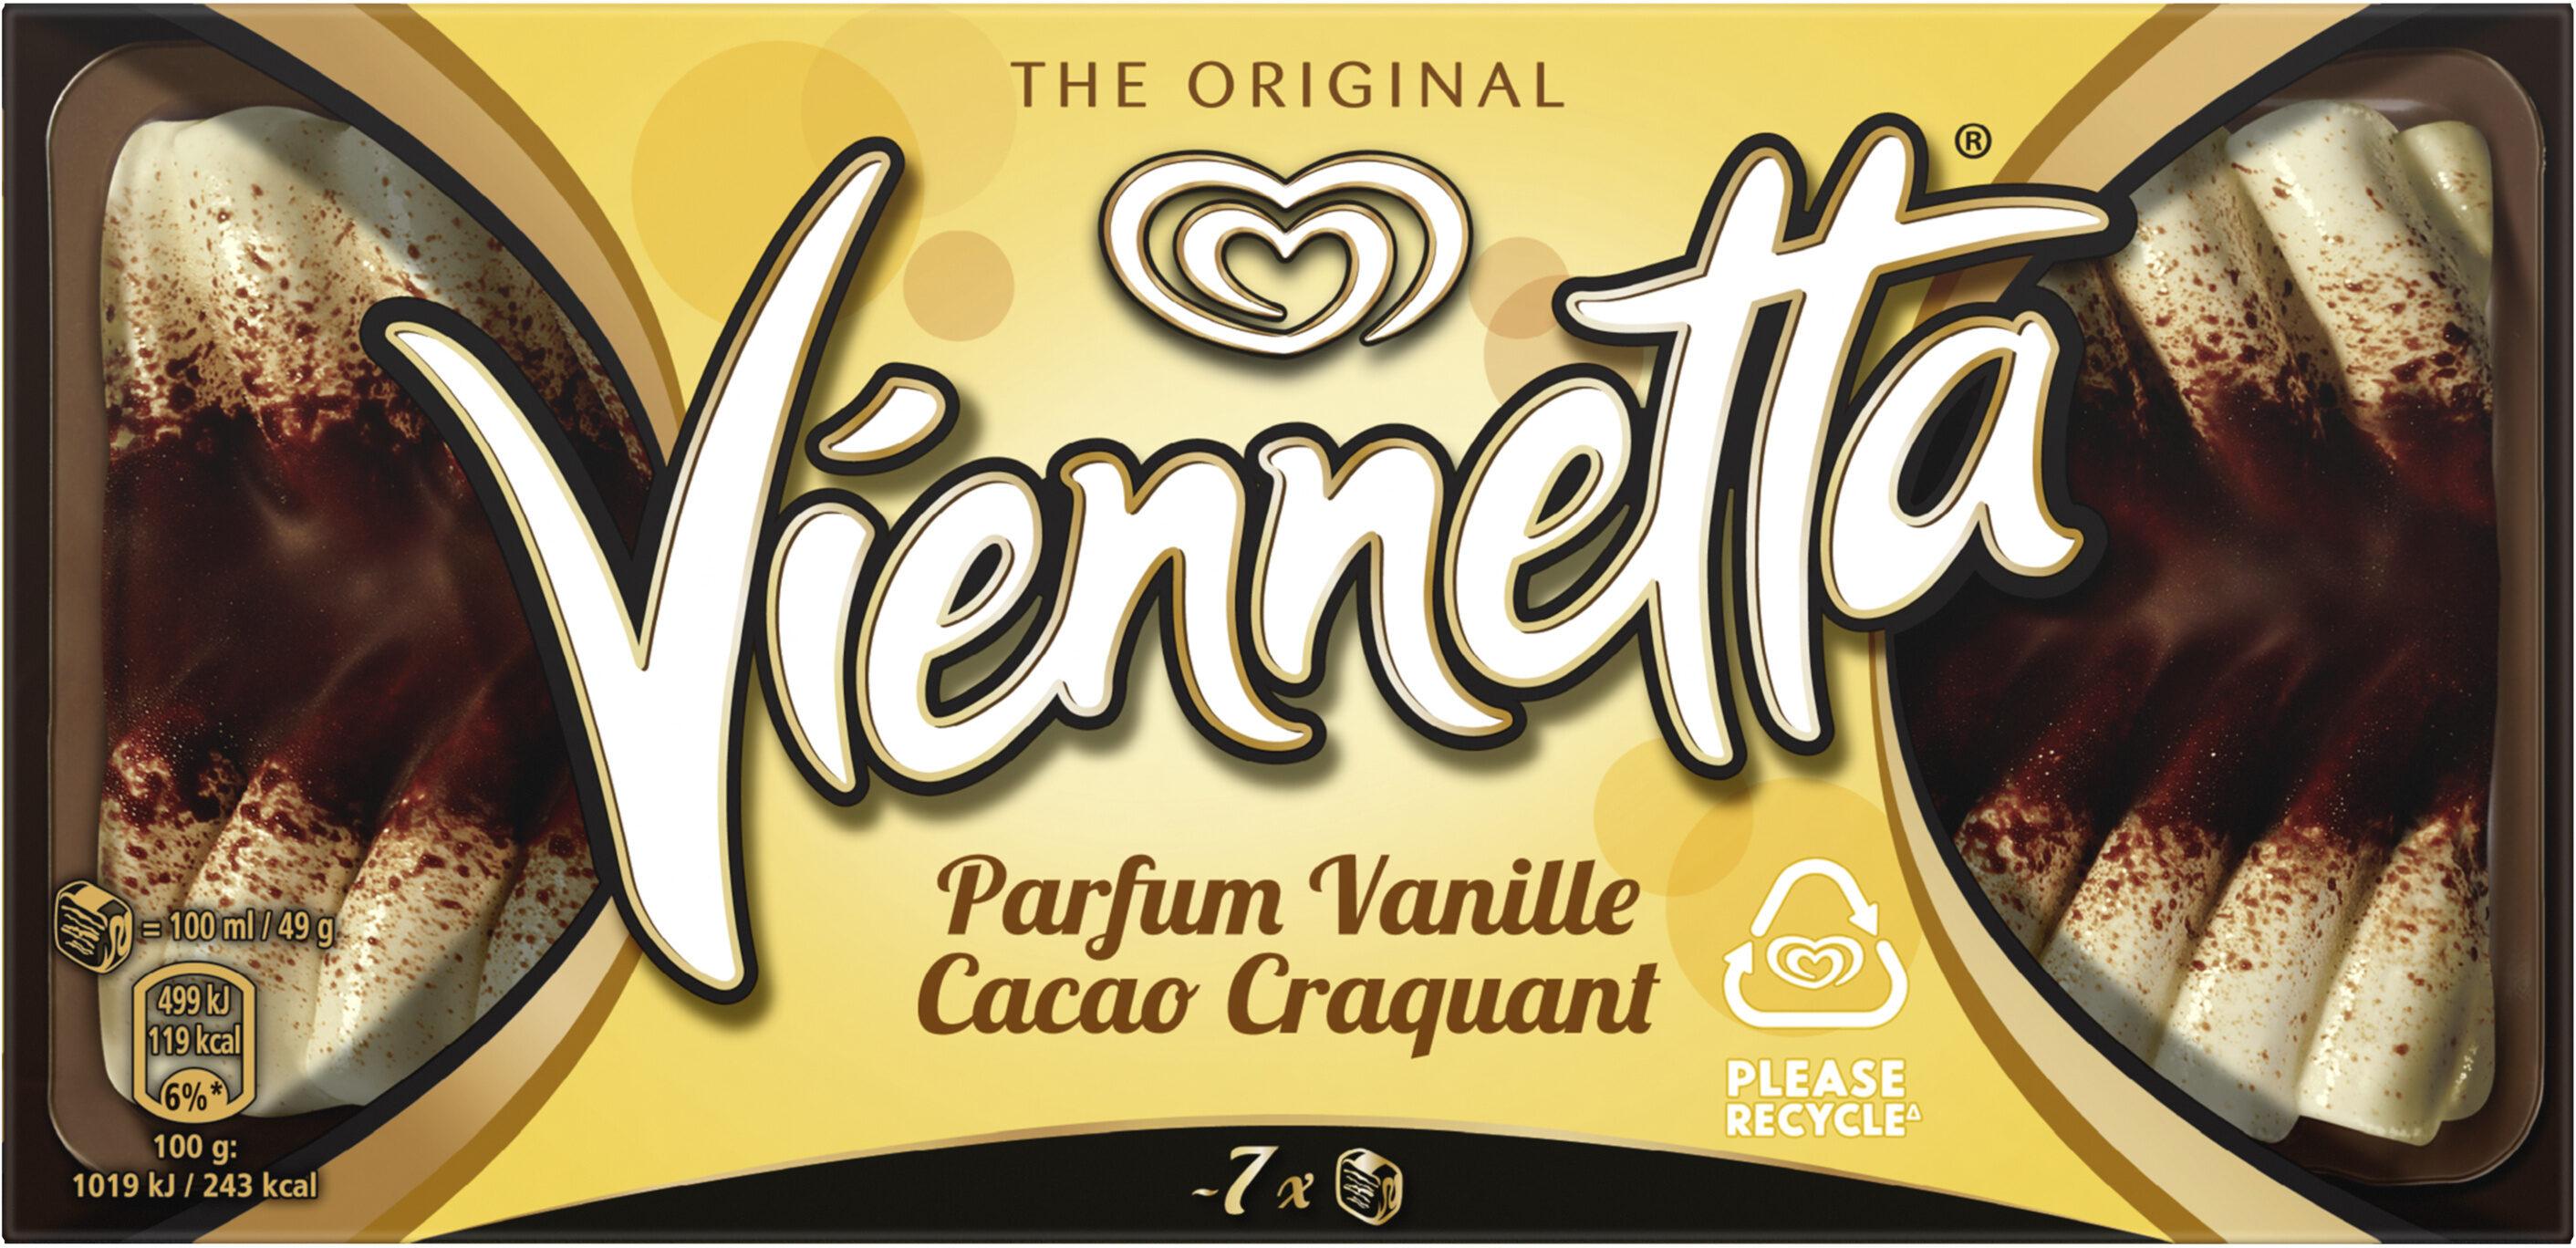 Viennetta Dessert Glacé Parfum Vanille Cacao Craquant 7 parts 650ml - Product - fr